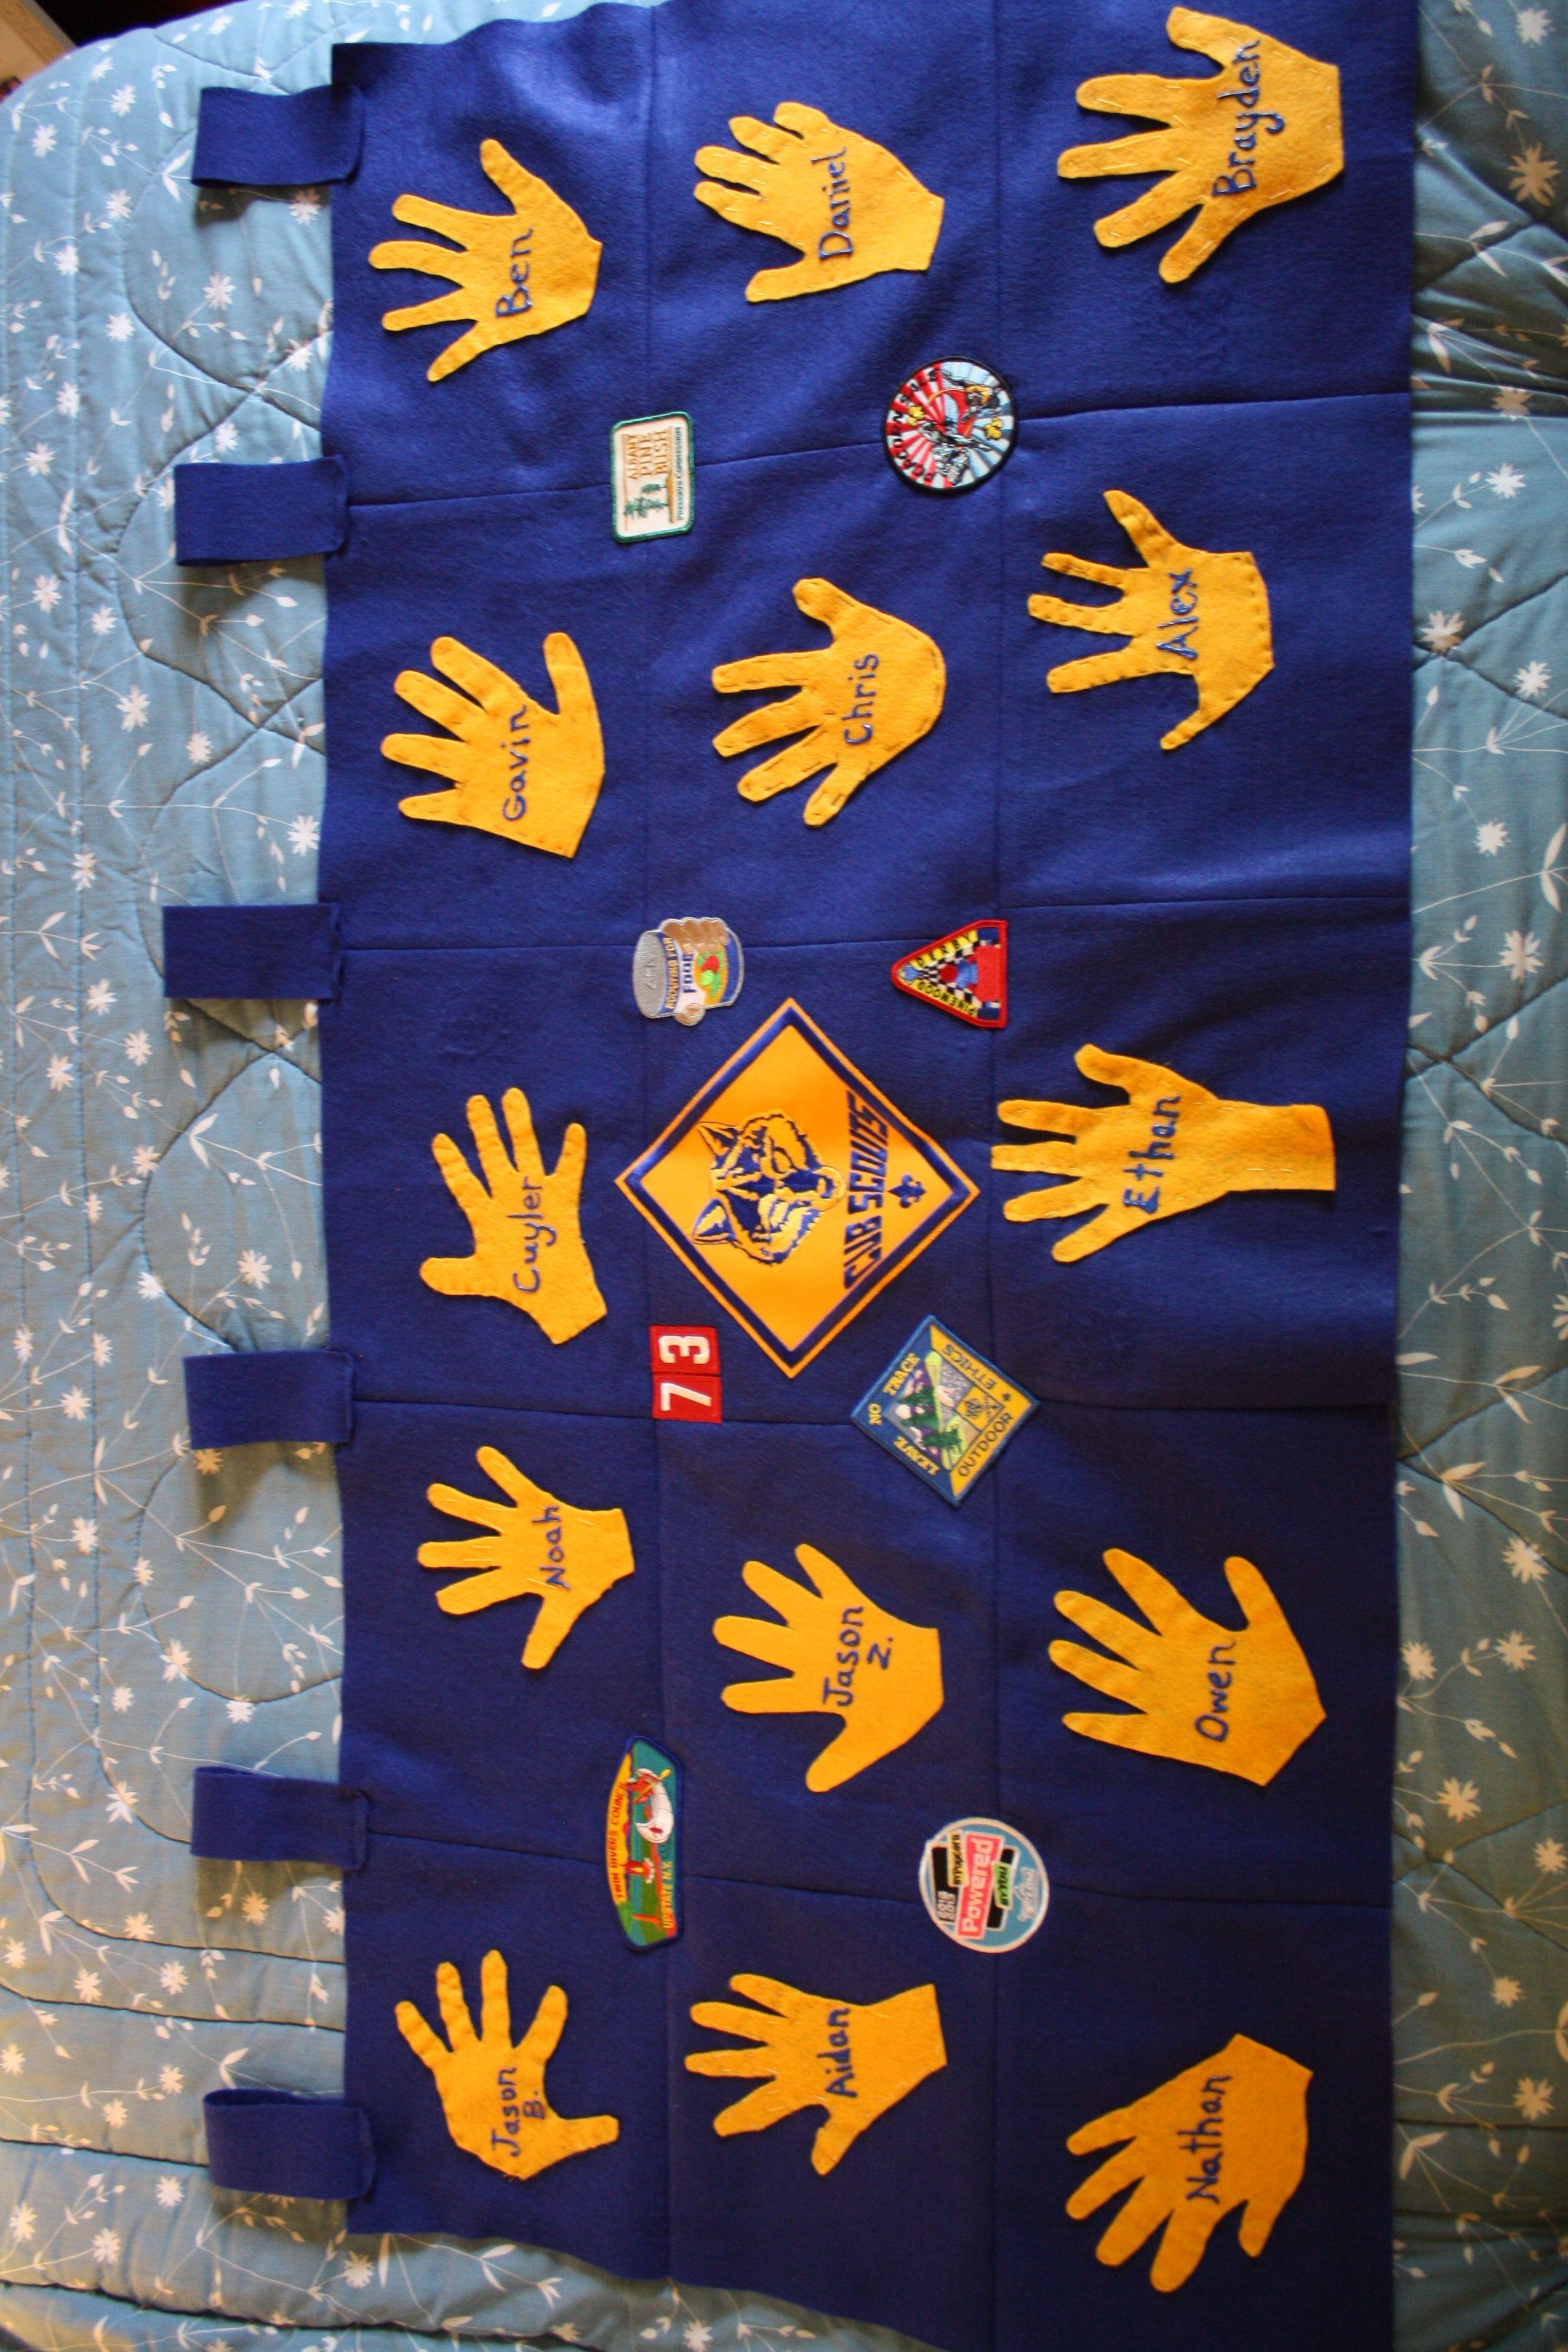 Cub Scout Hands Flag Nice Den Activity Cool